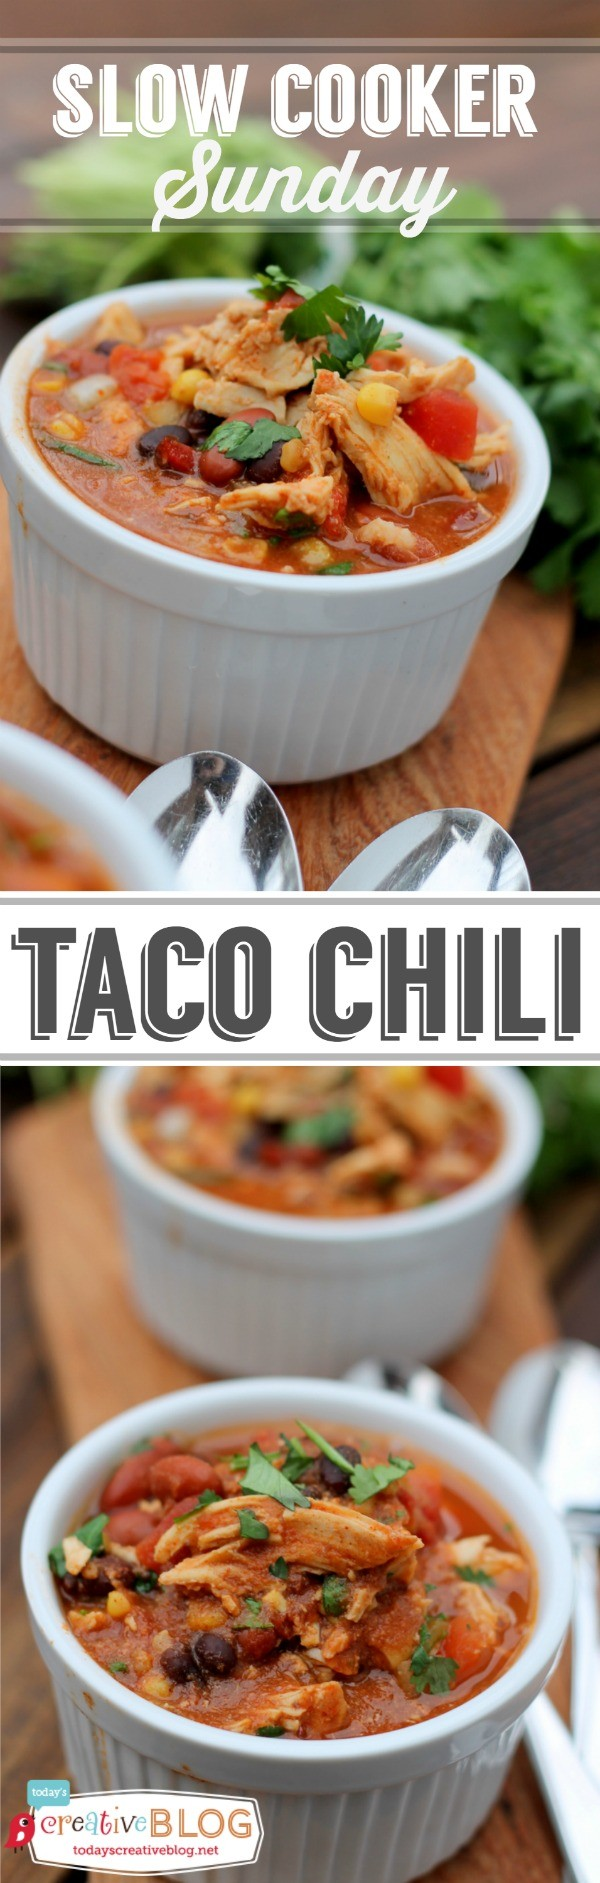 Slow Cooker Taco Chili Recipe | TodaysCreativeblog.net